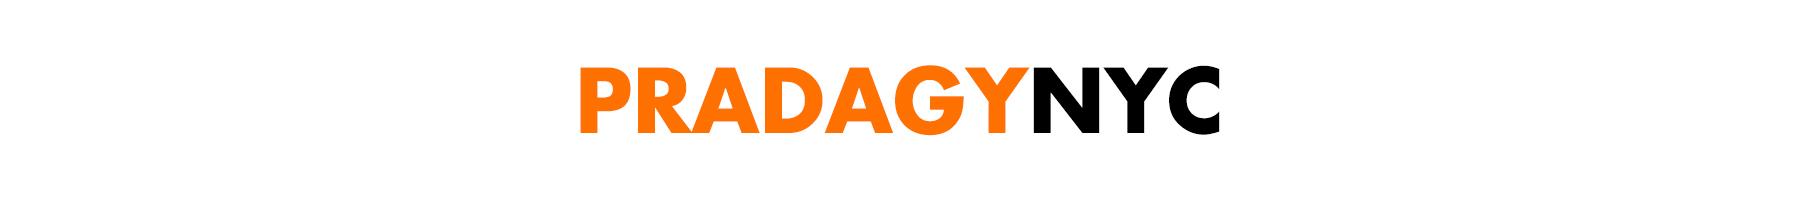 DrJays.com - Pradagy NYC